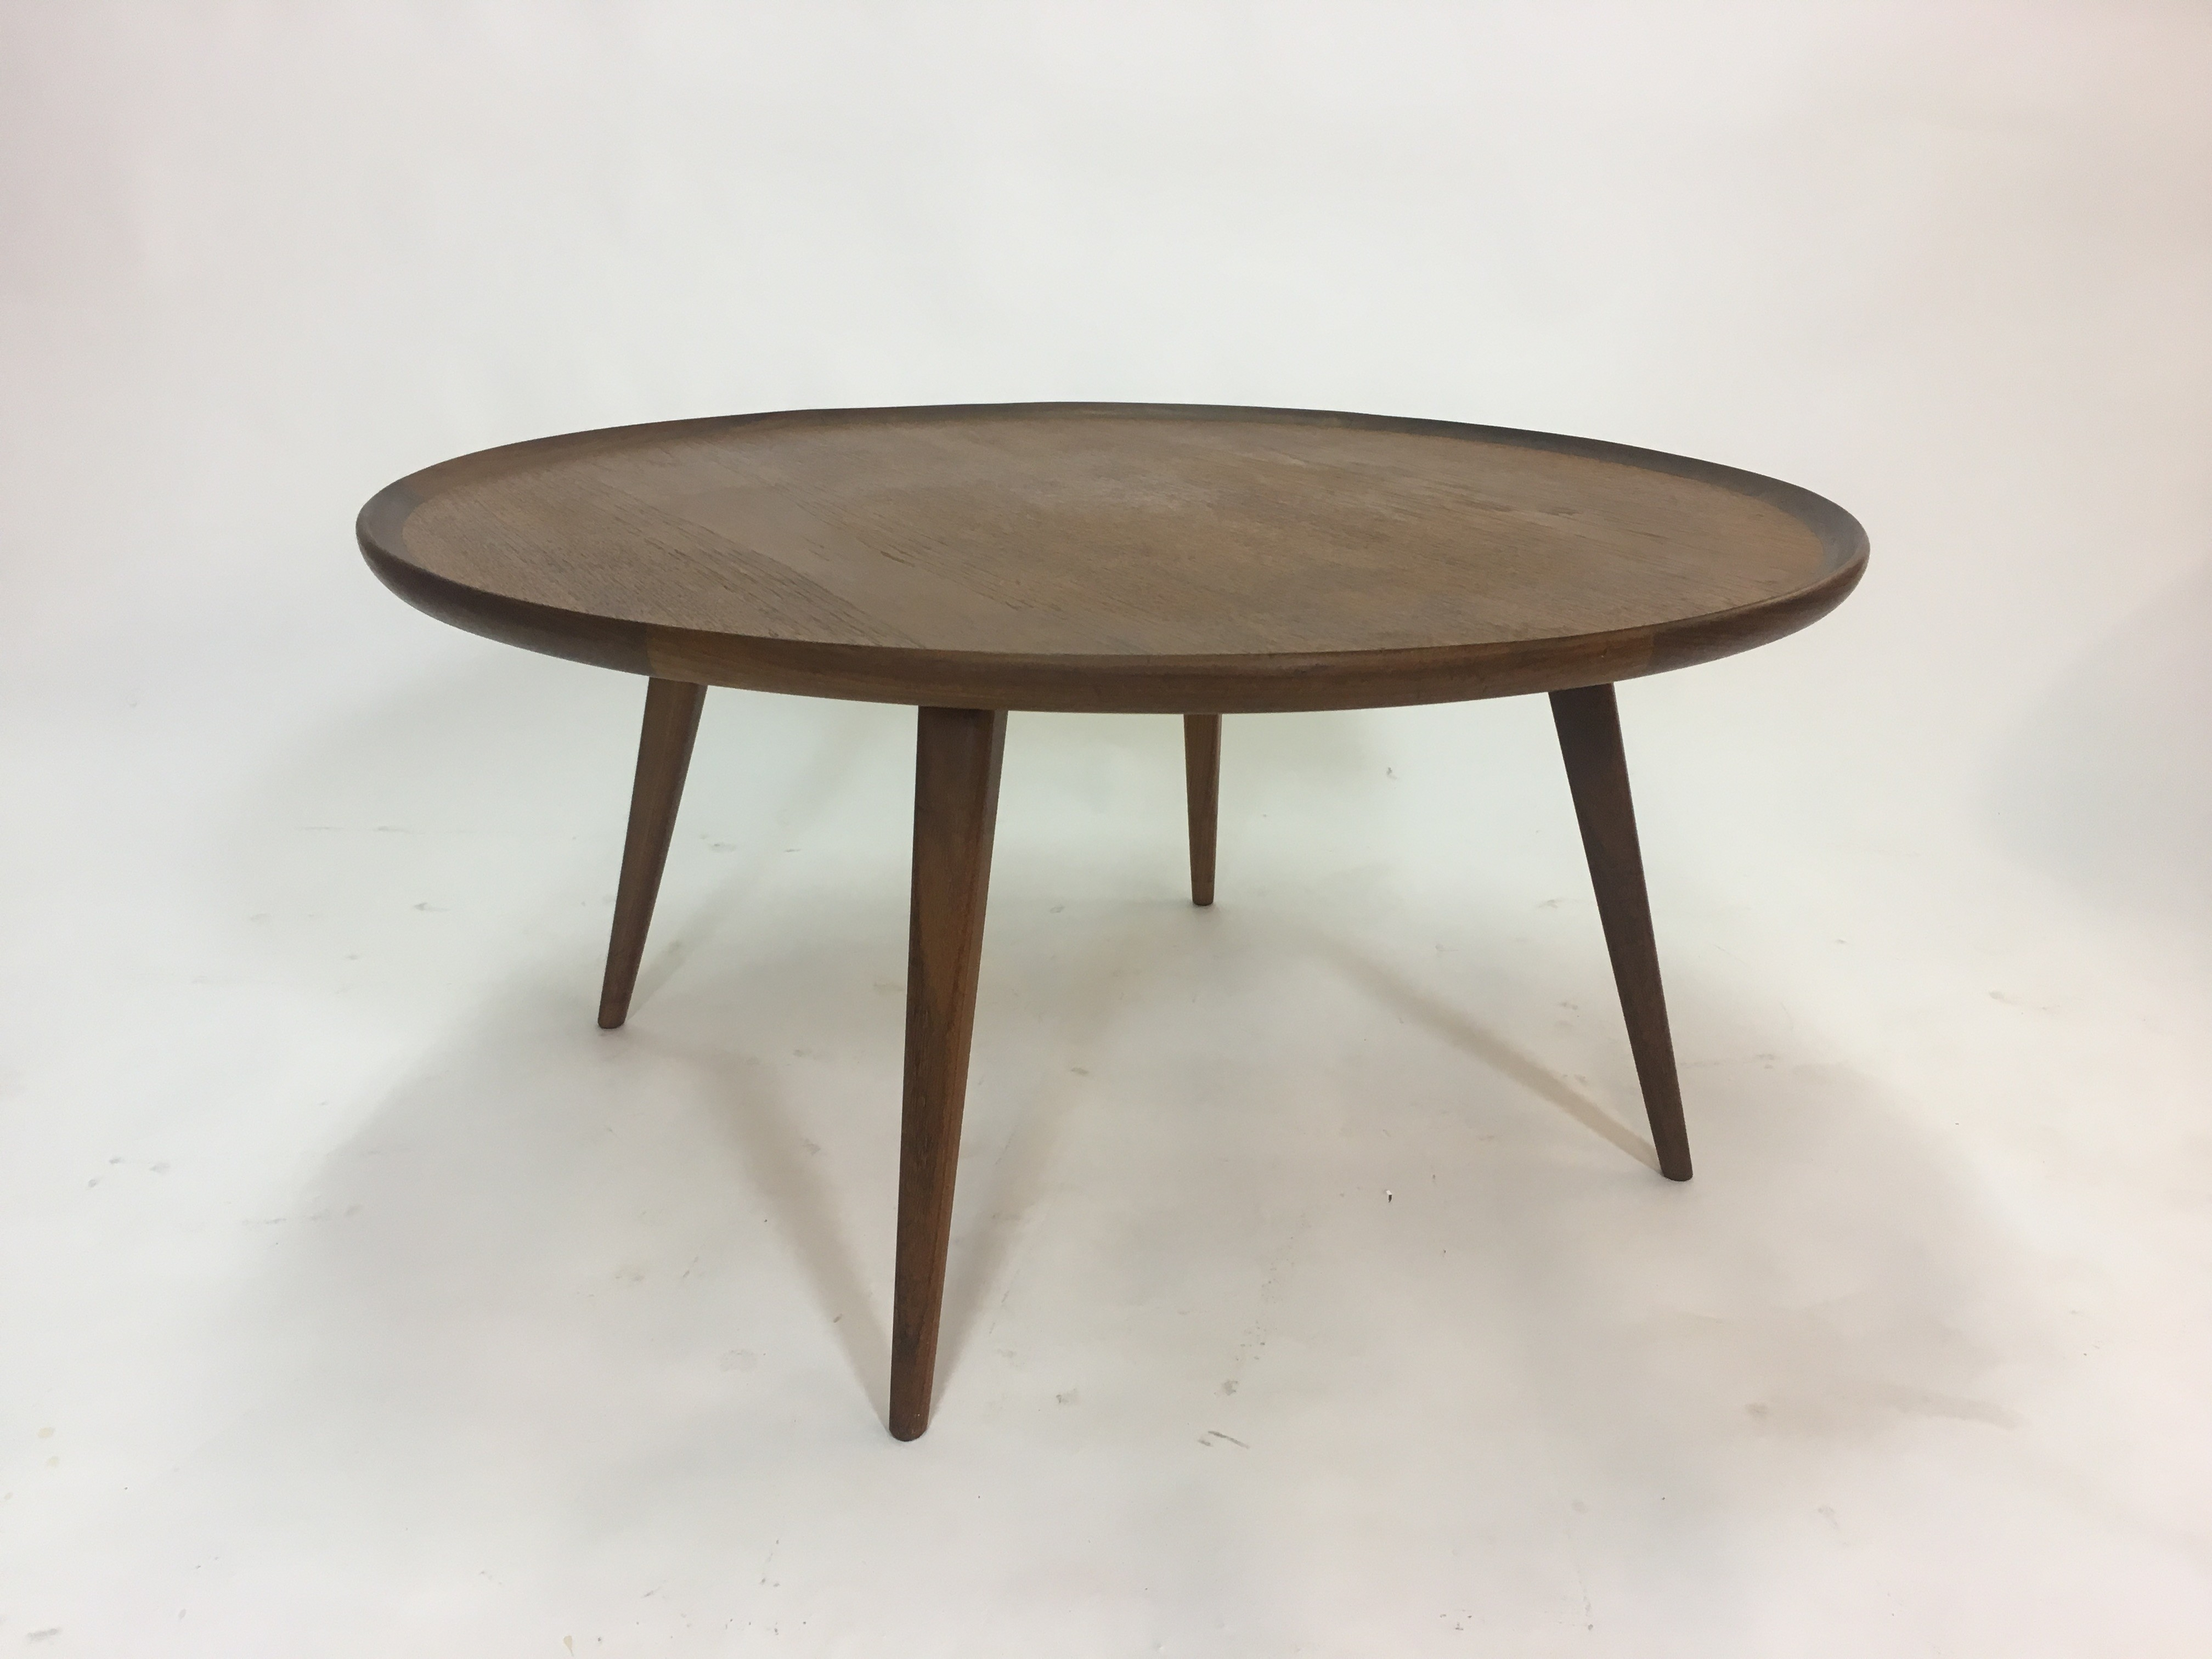 Vintage Round Teak Coffee Table - 1950s - Design Market